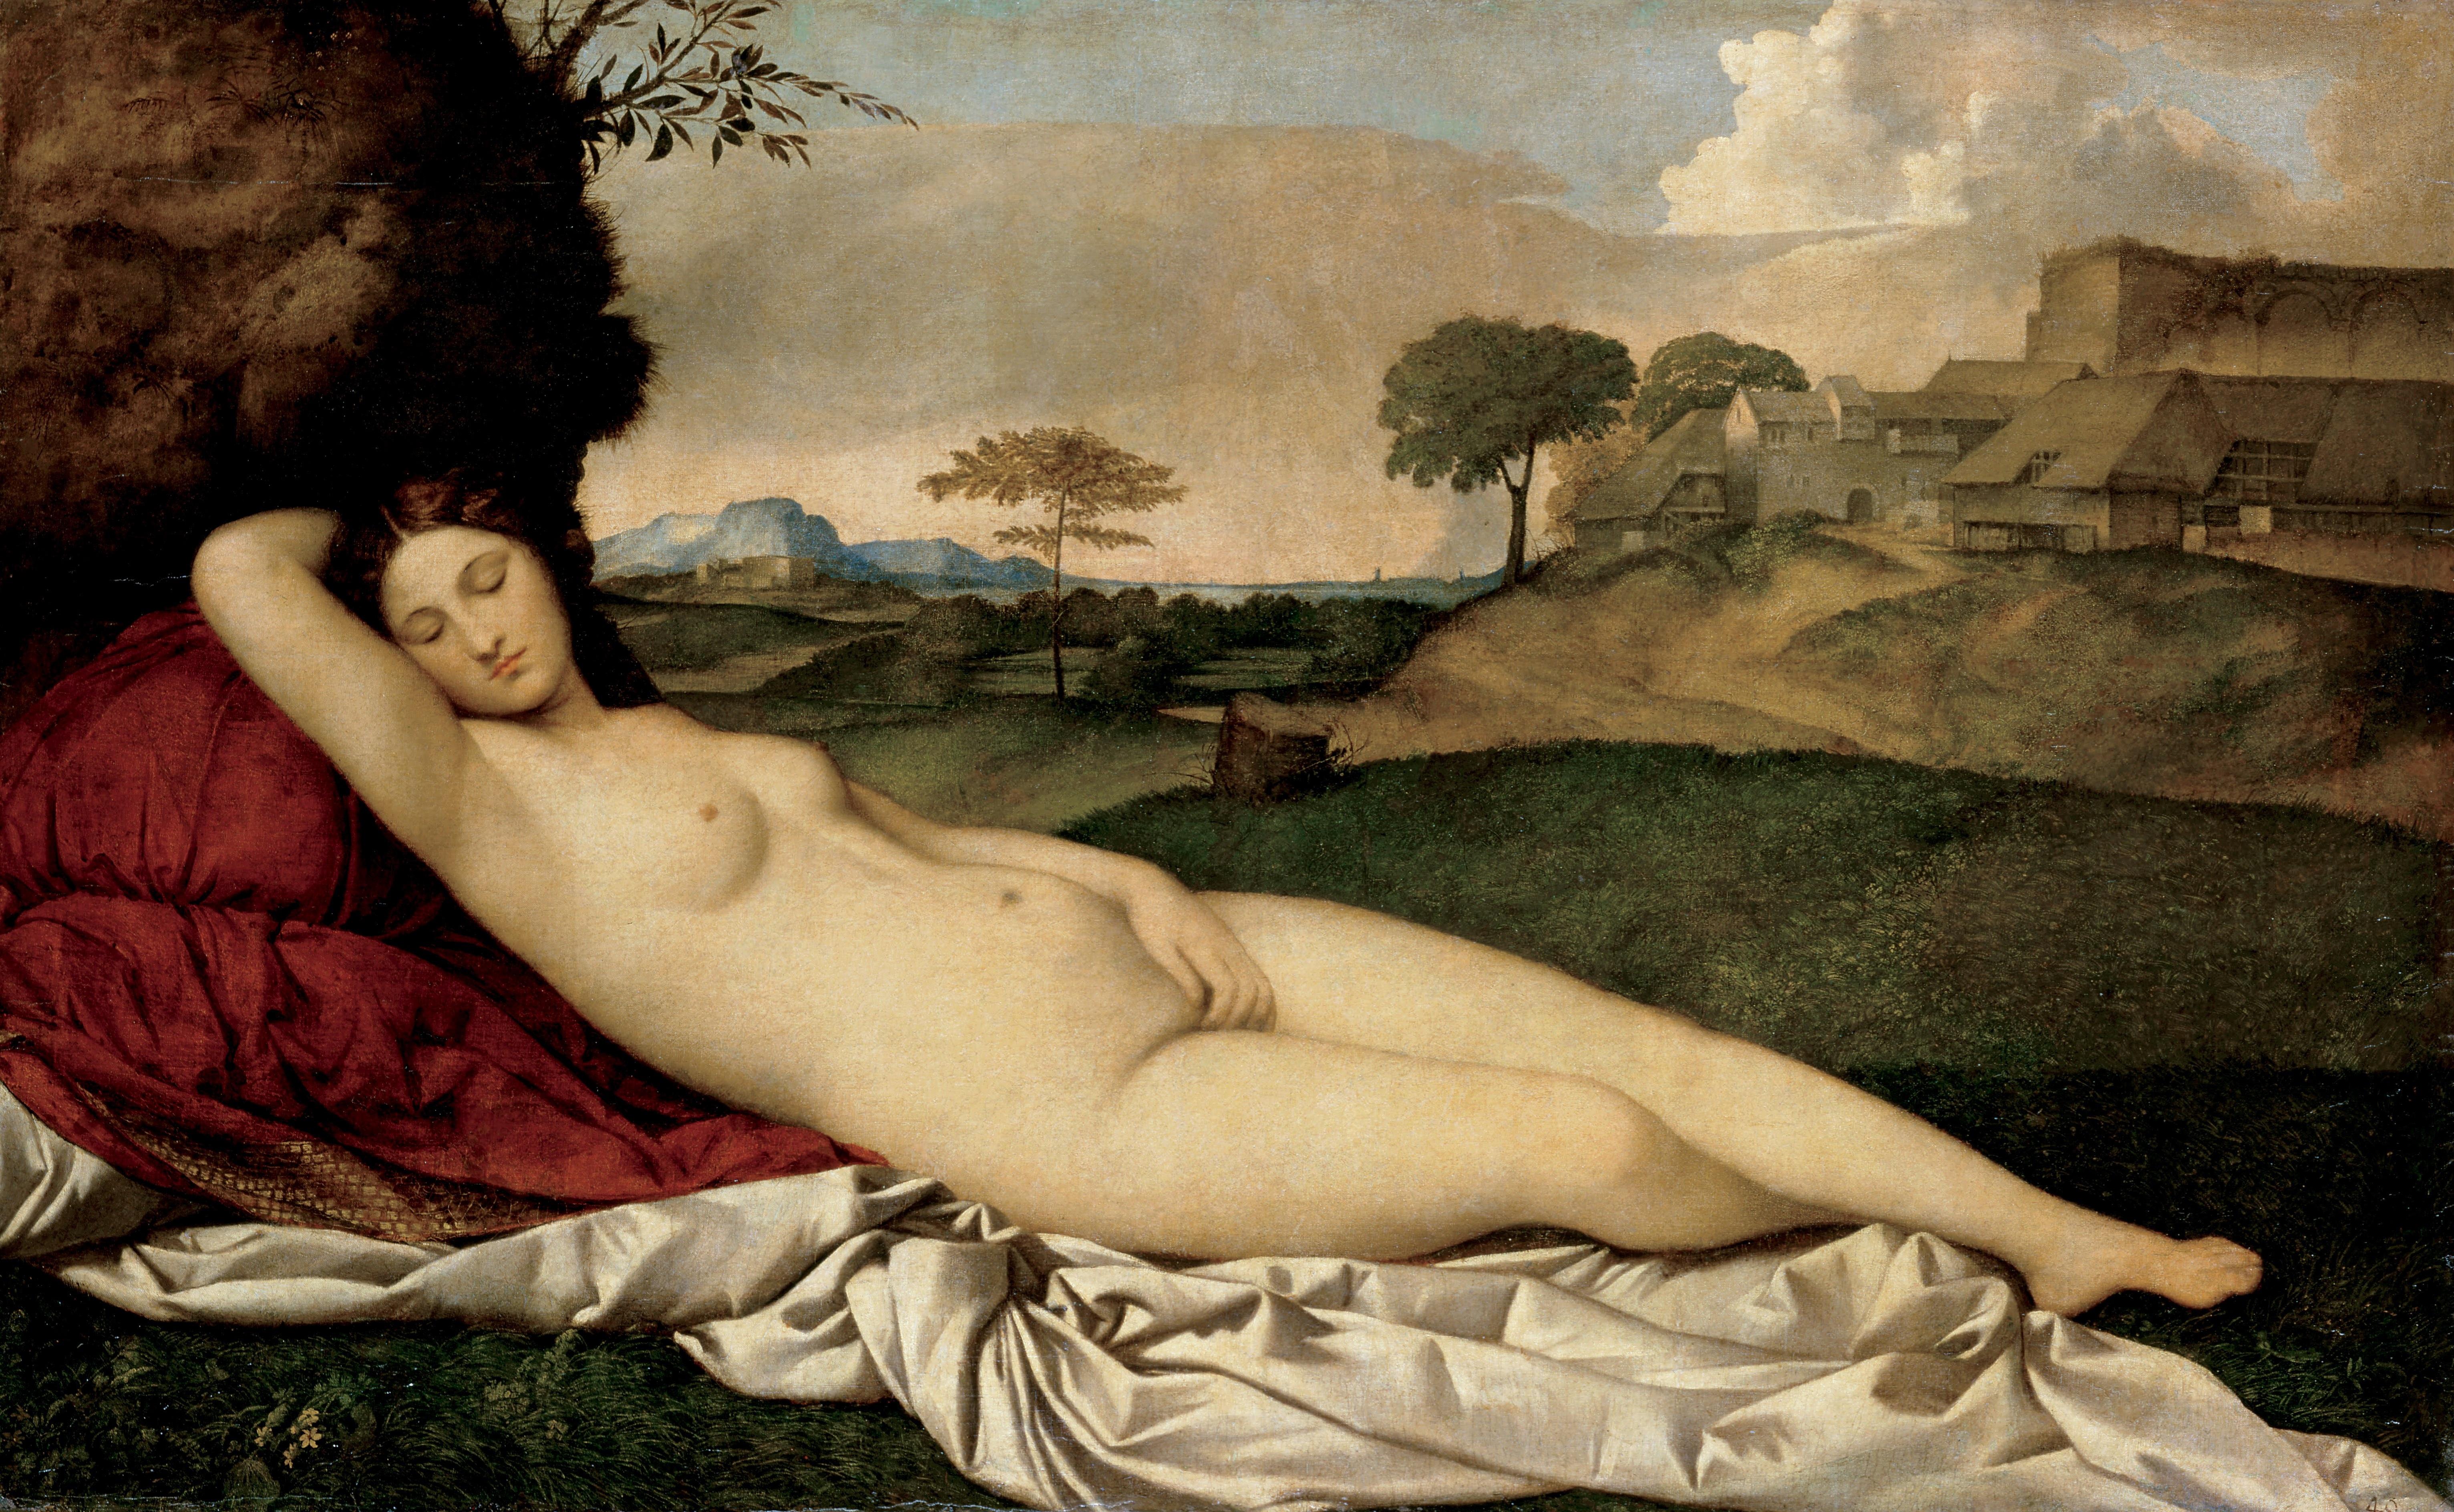 https://upload.wikimedia.org/wikipedia/commons/8/86/Giorgione_-_Sleeping_Venus_-_Google_Art_Project_2.jpg?uselang=fr